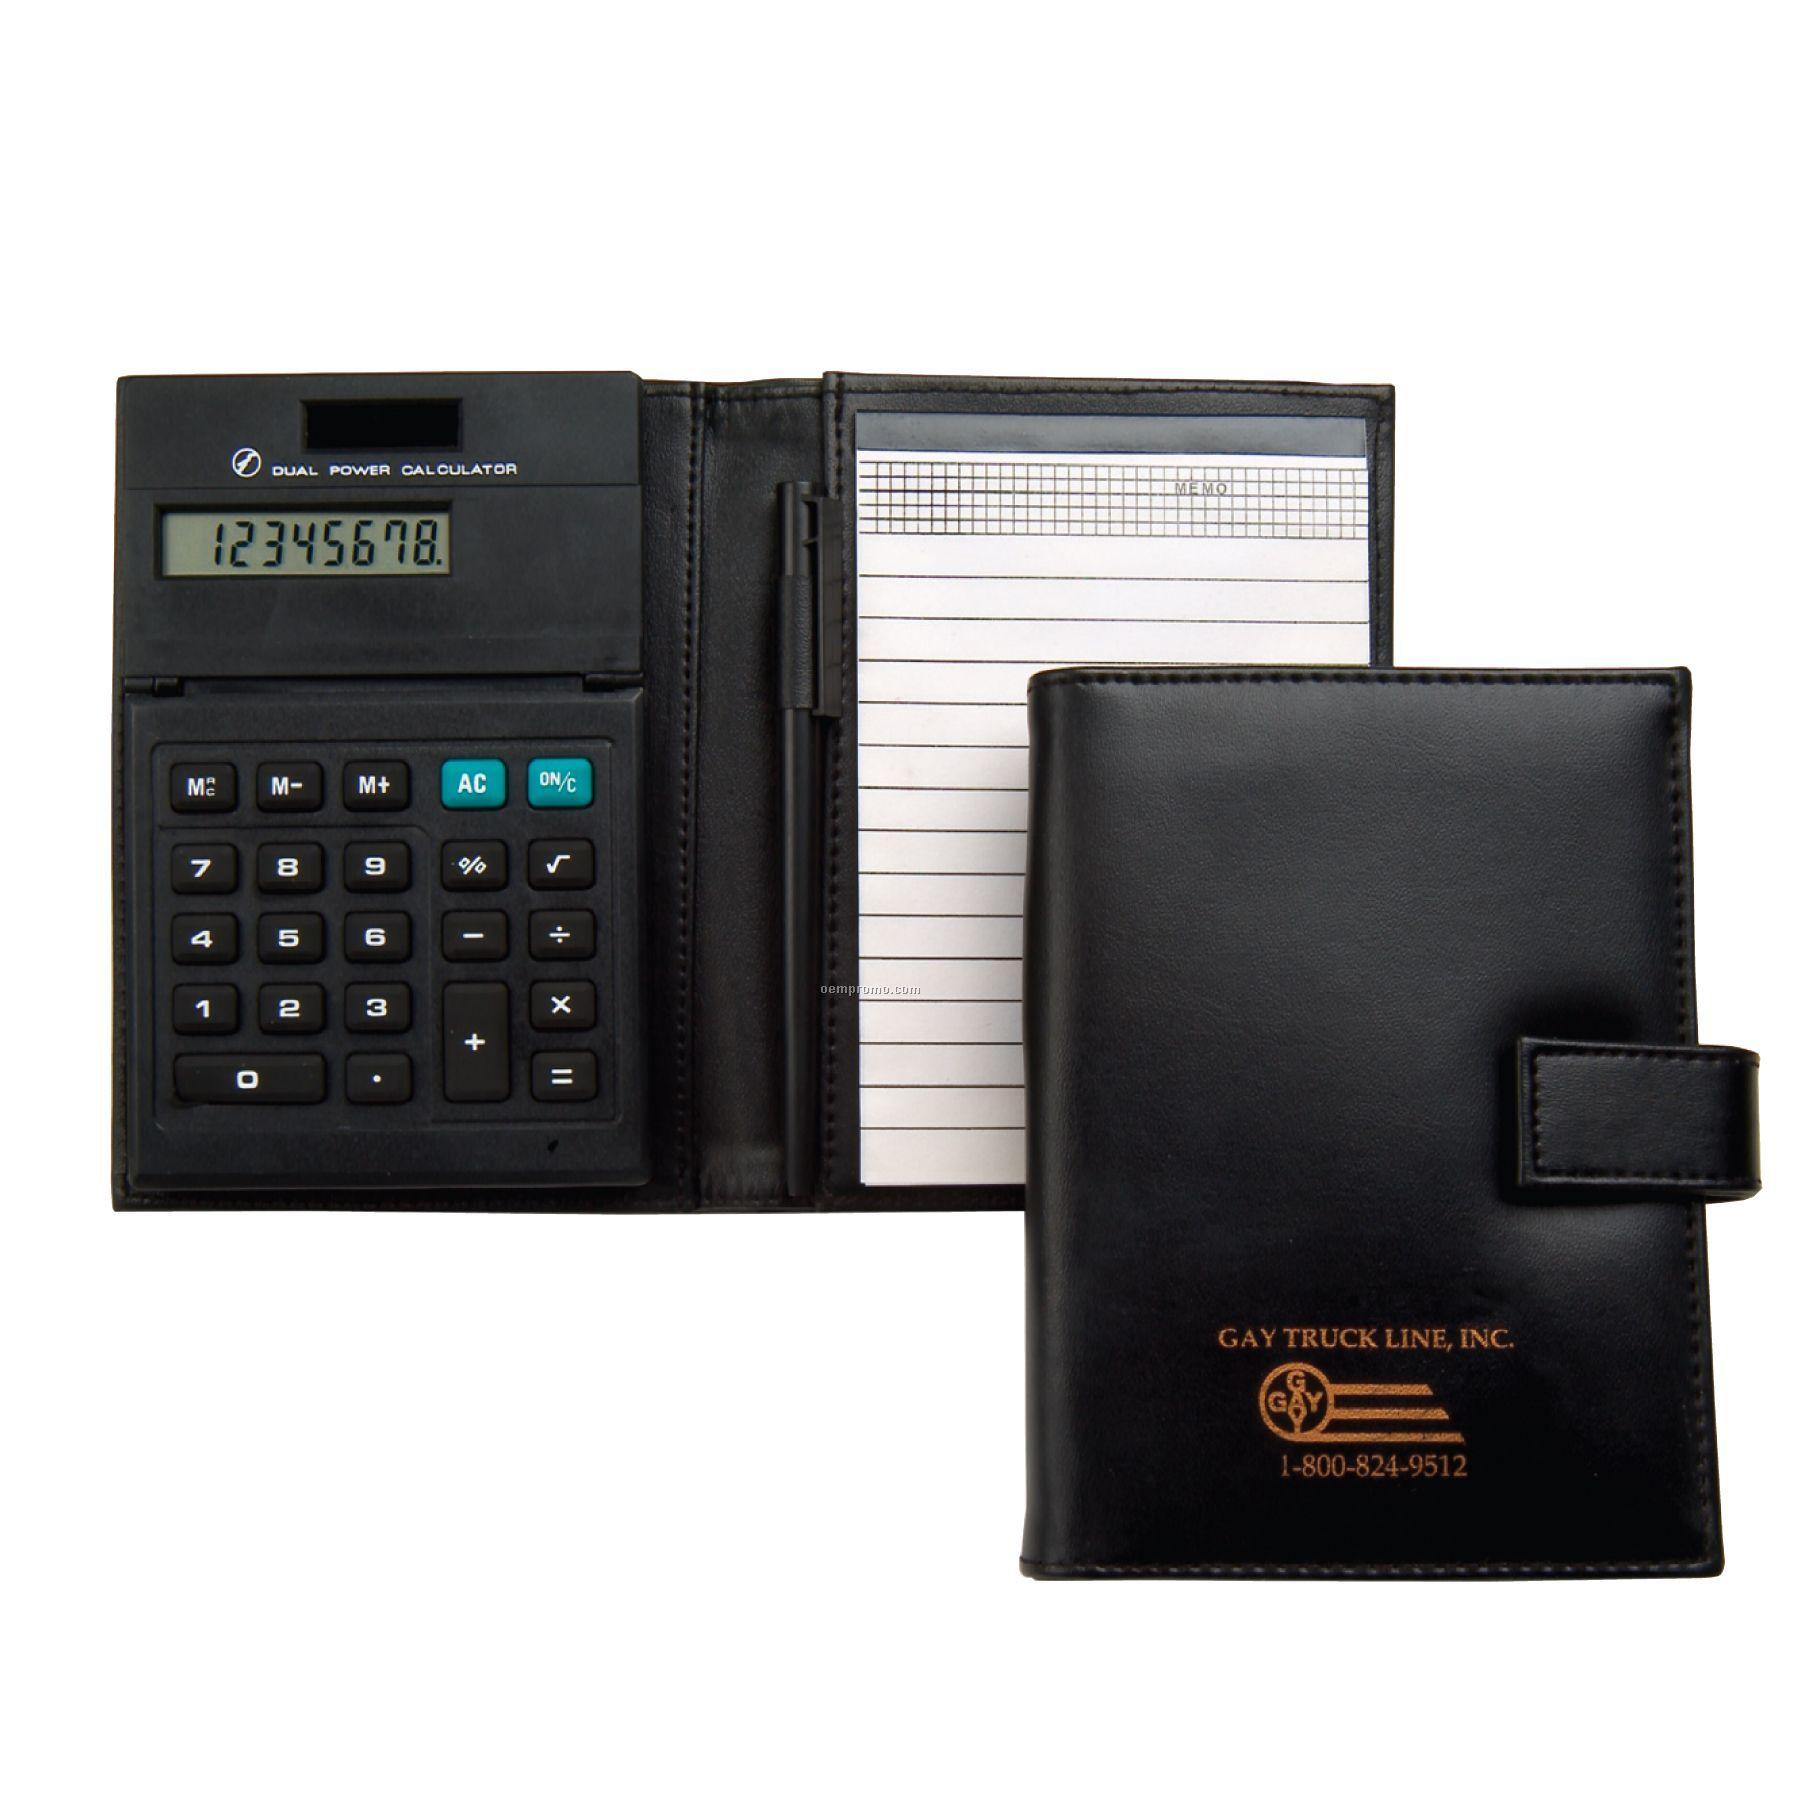 Junior Folder W/Dual Power Calculator